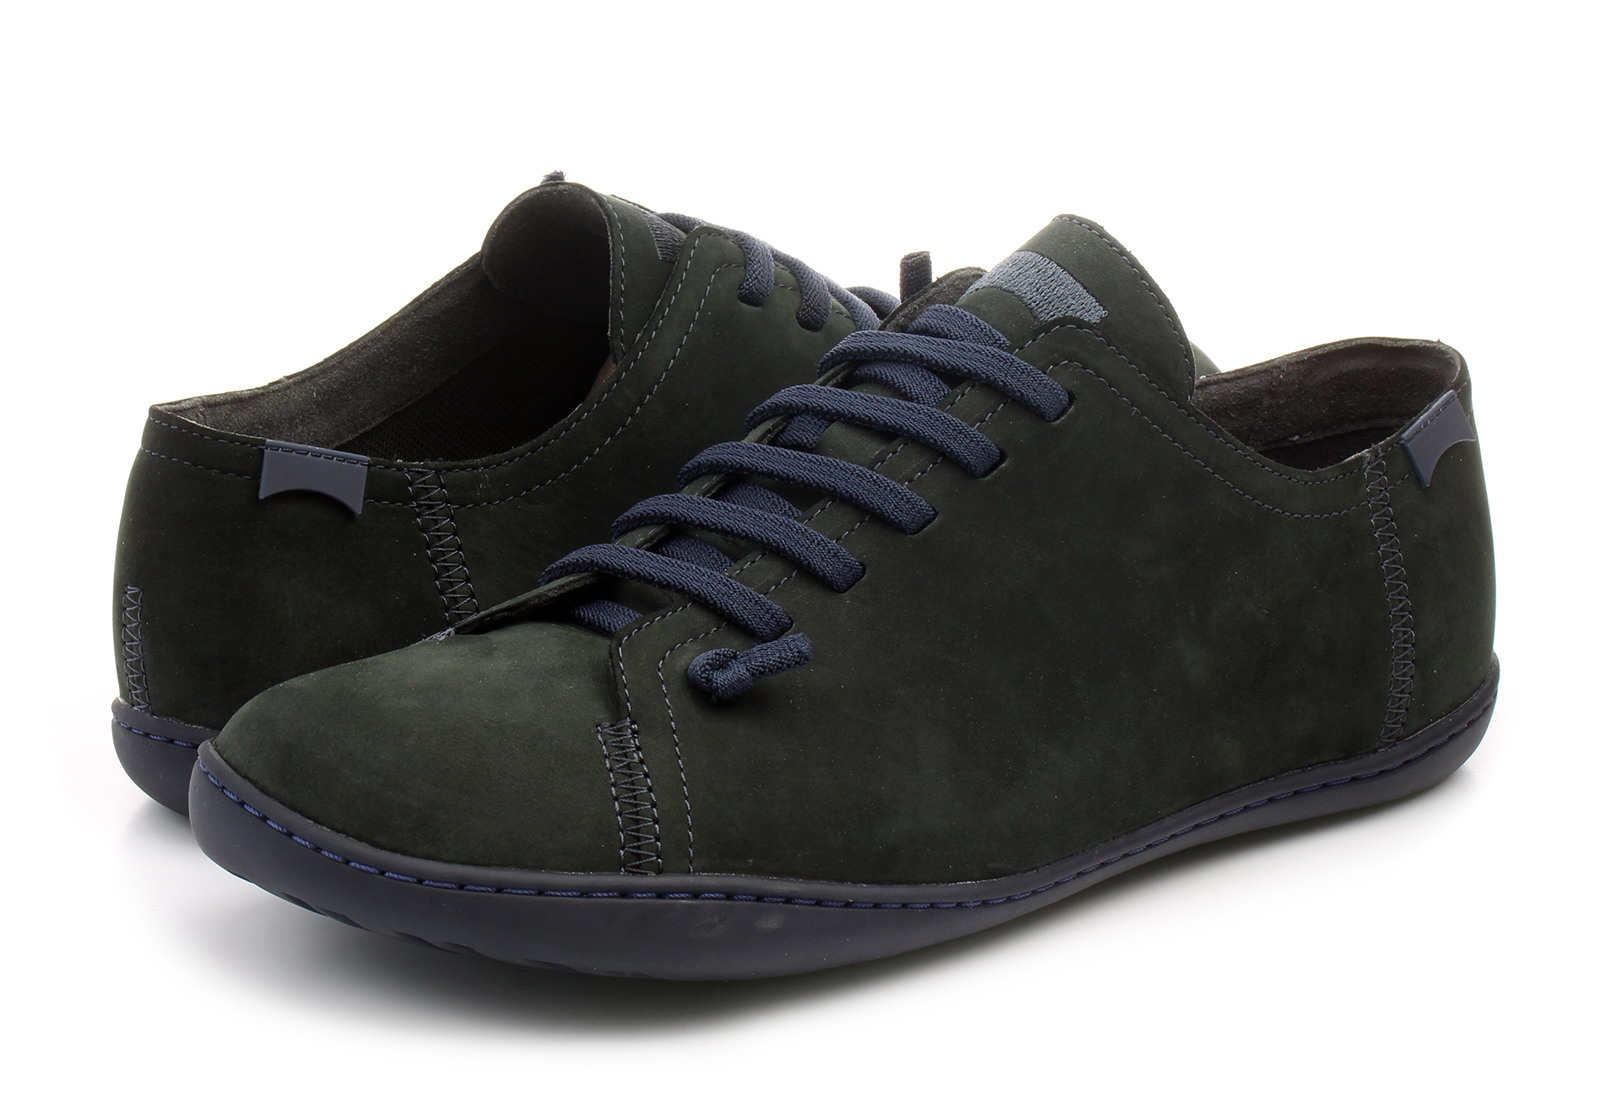 Camper Cipő - Peu Cami - 17665-170 - Office Shoes Magyarország c832d48bf2